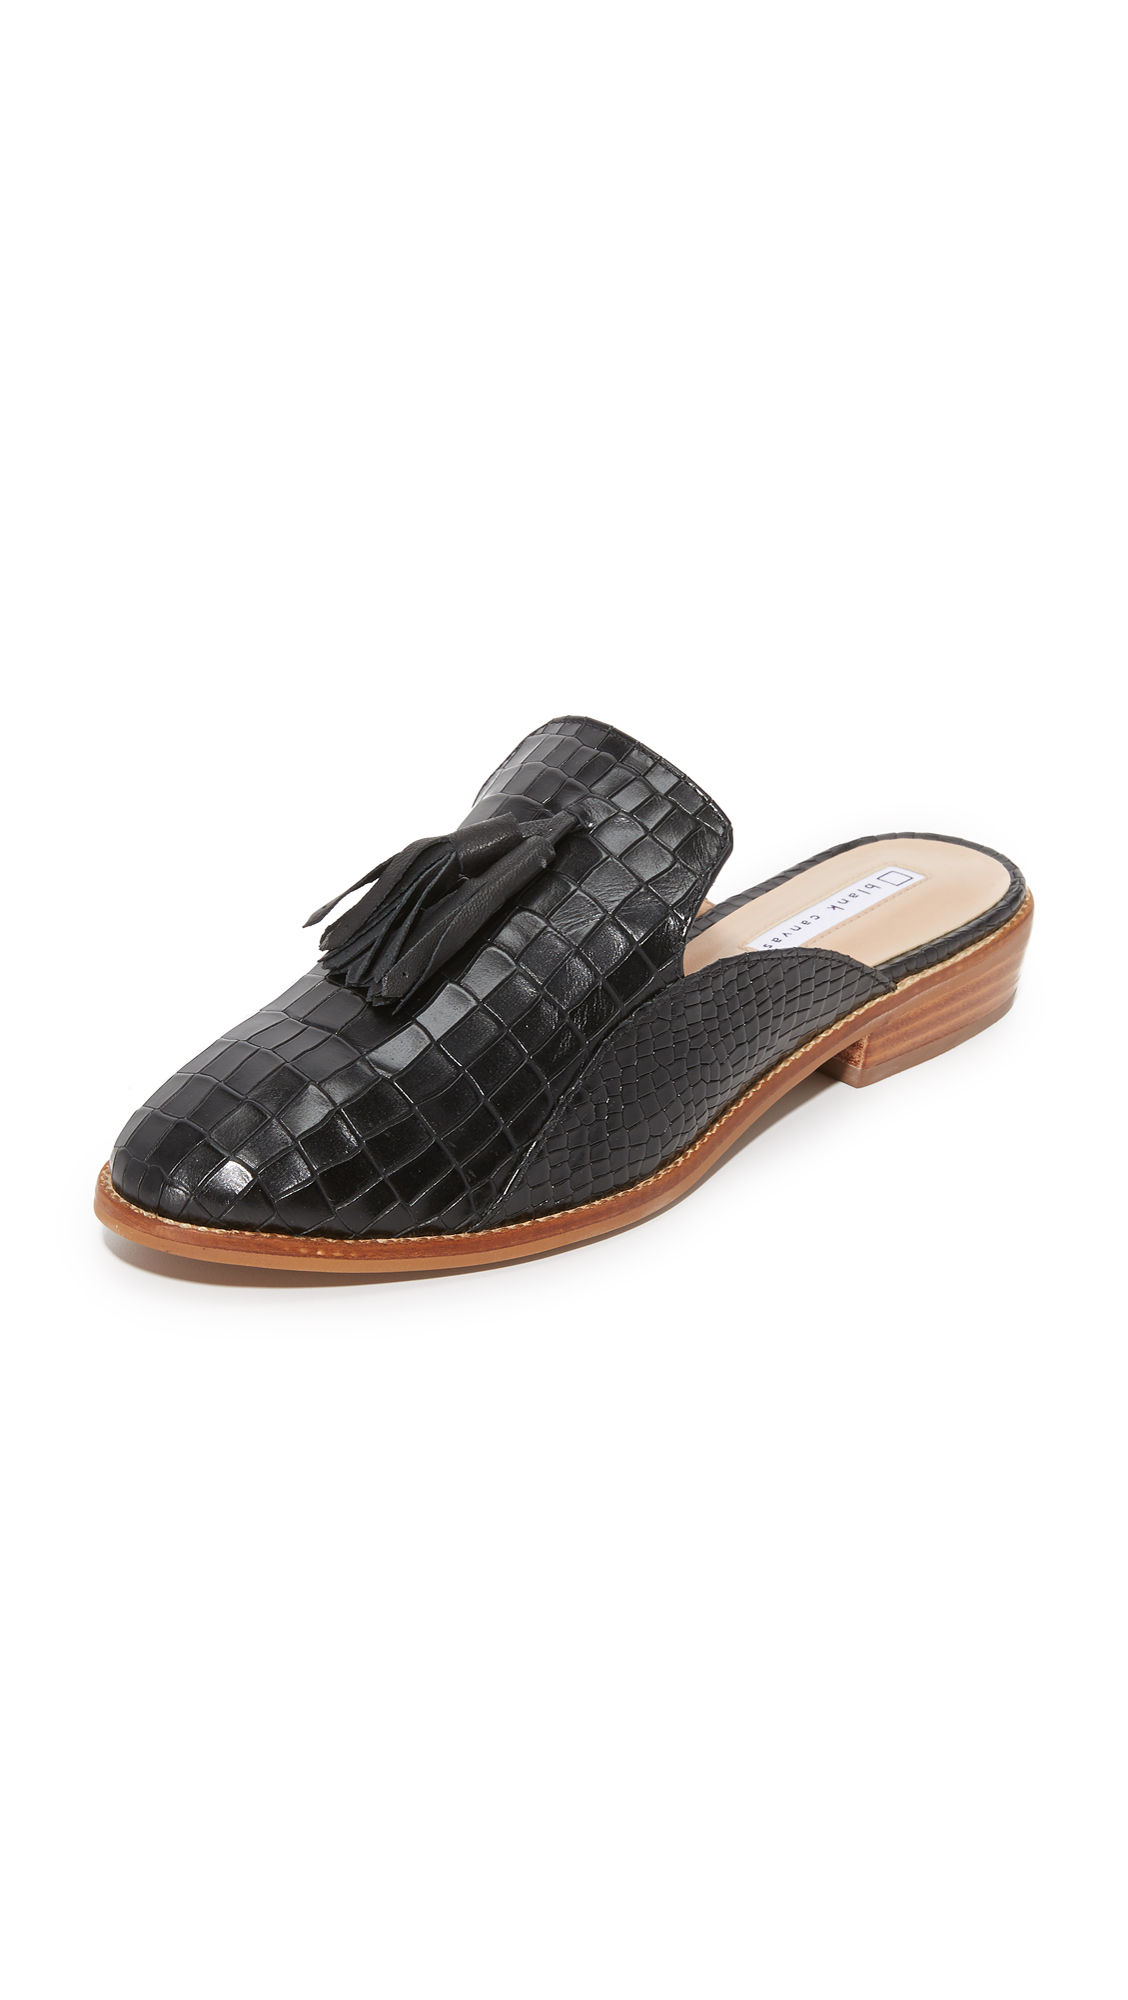 Blank Canvas Croco Mule Tassel Slides - Black at Shopbop